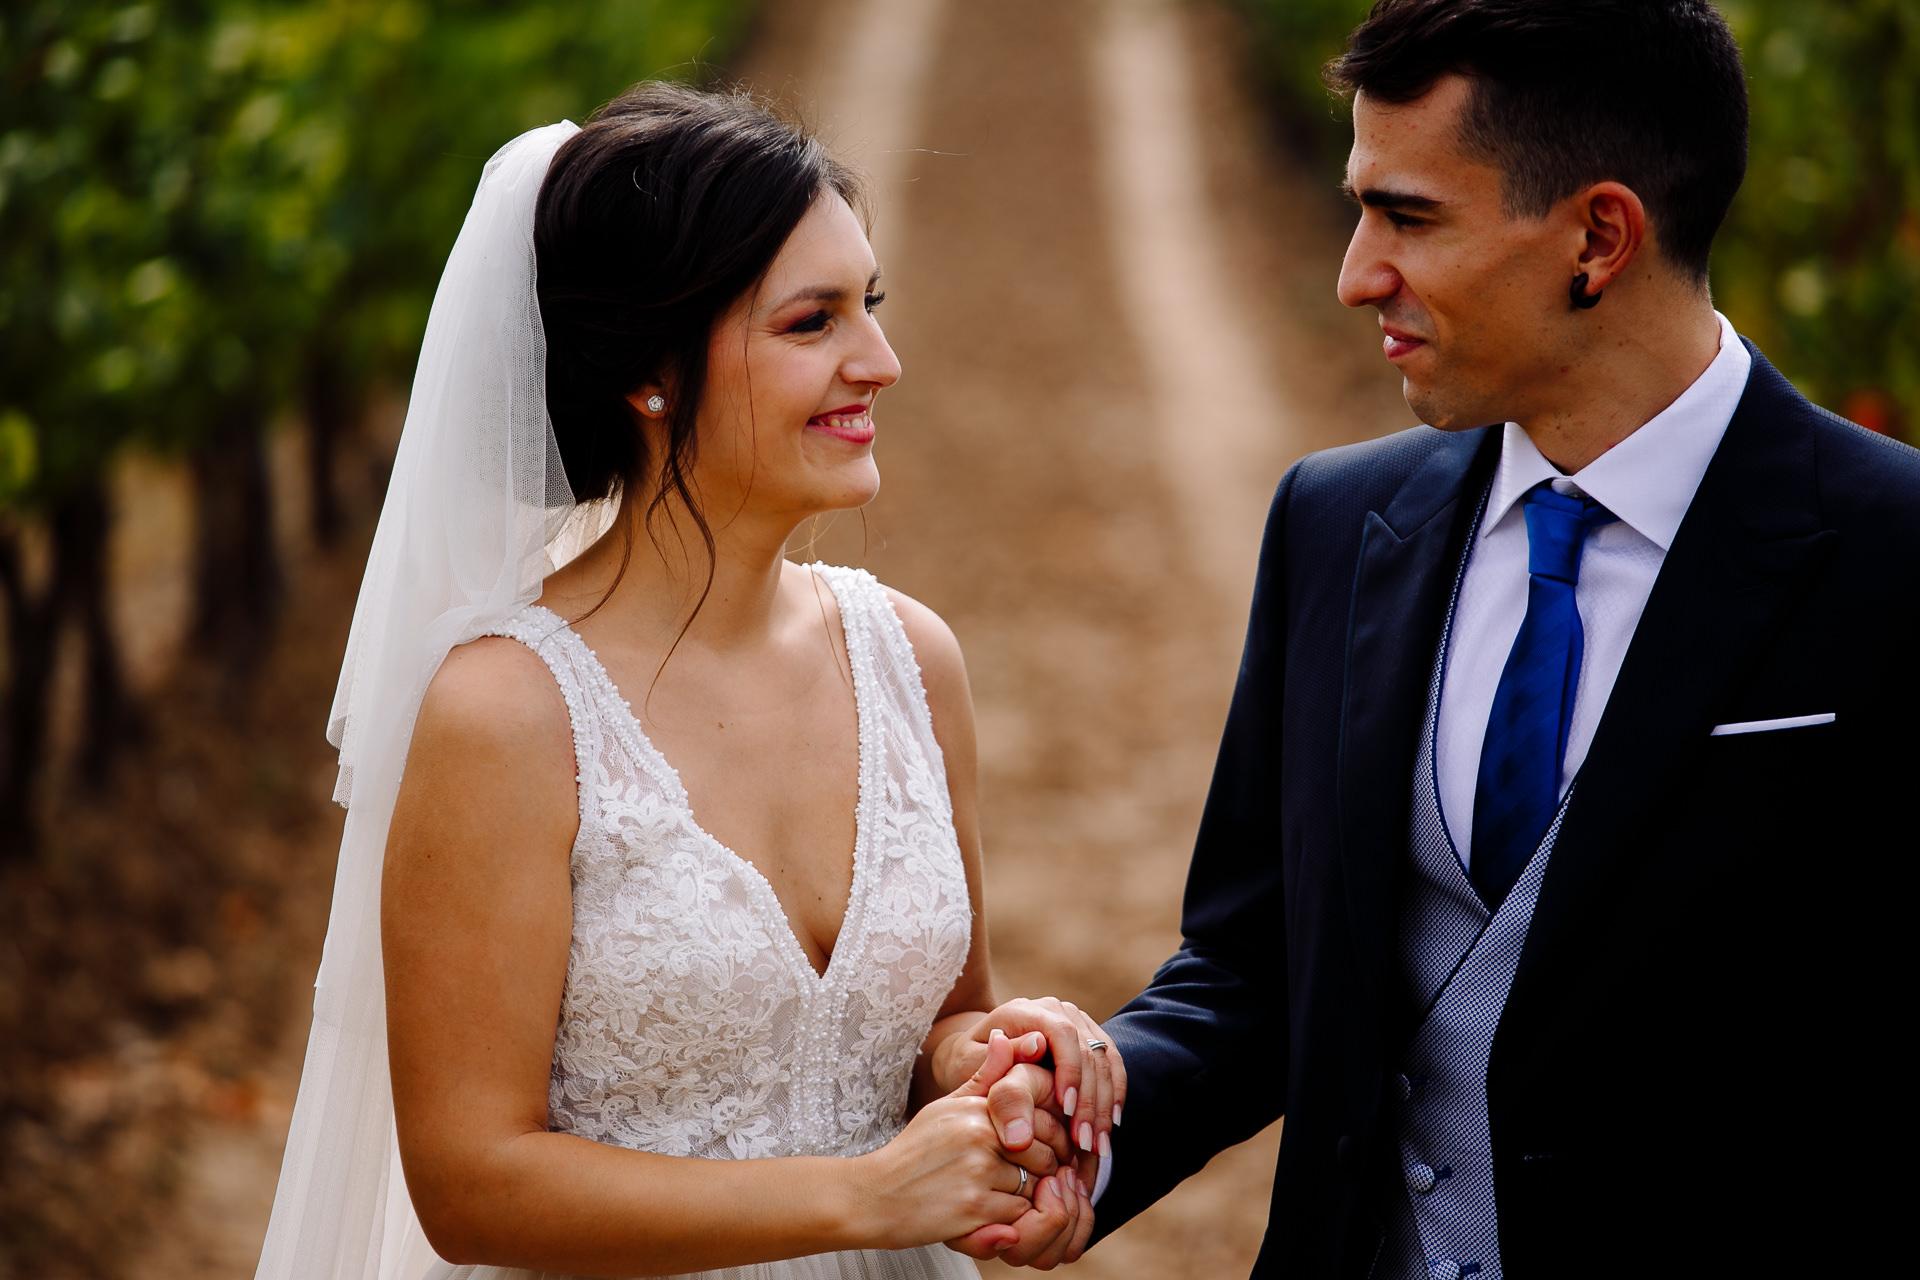 boda civil eguren ugarte larioja 150434